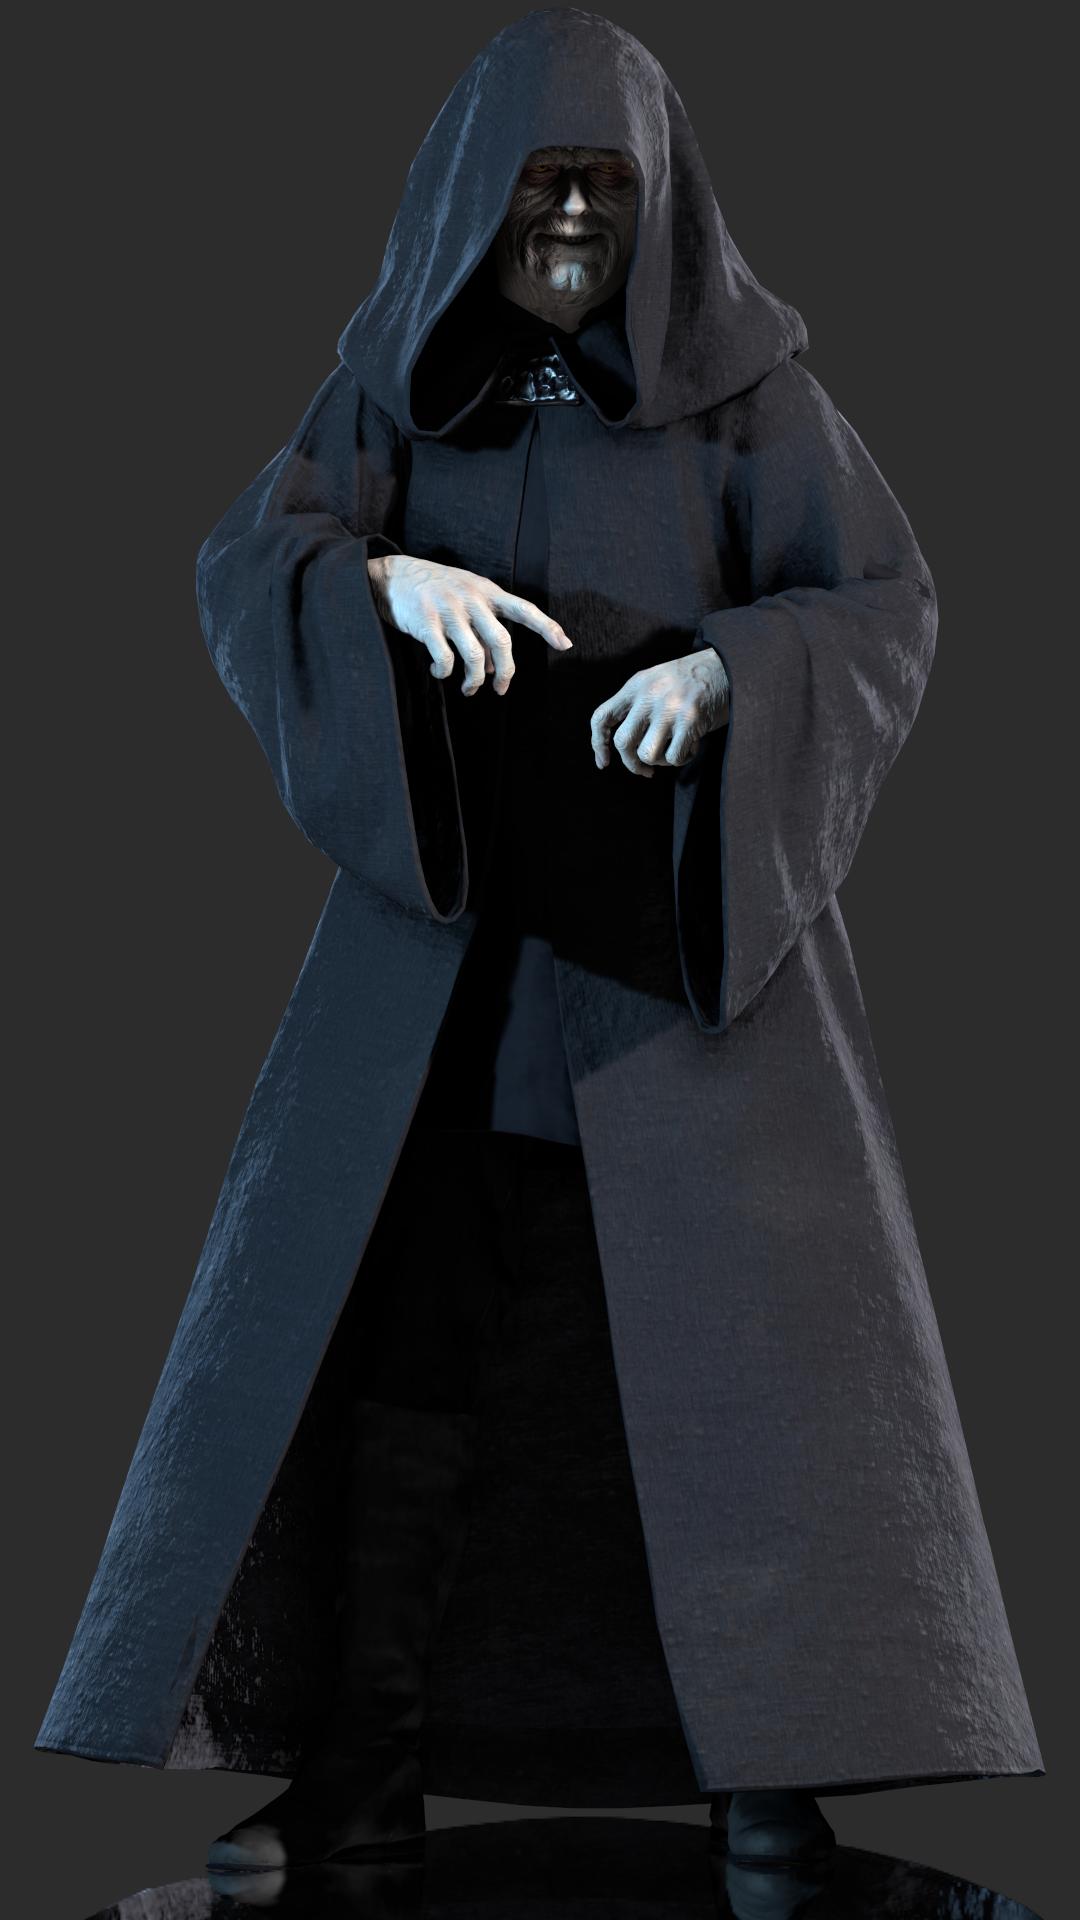 Emperor Sheev Palpatine By Yare Yare Dong Star Wars Cartoon Star Wars Empire Star Wars Sith